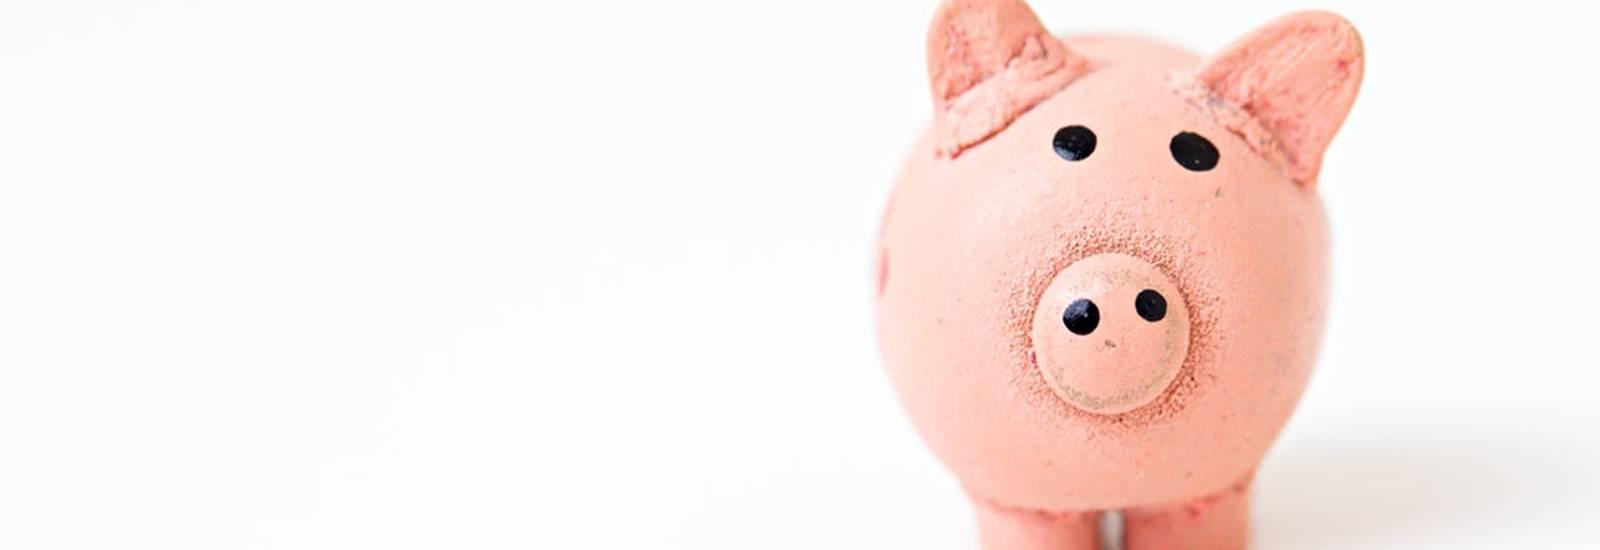 piggy-bank-tax-accountant.jpg